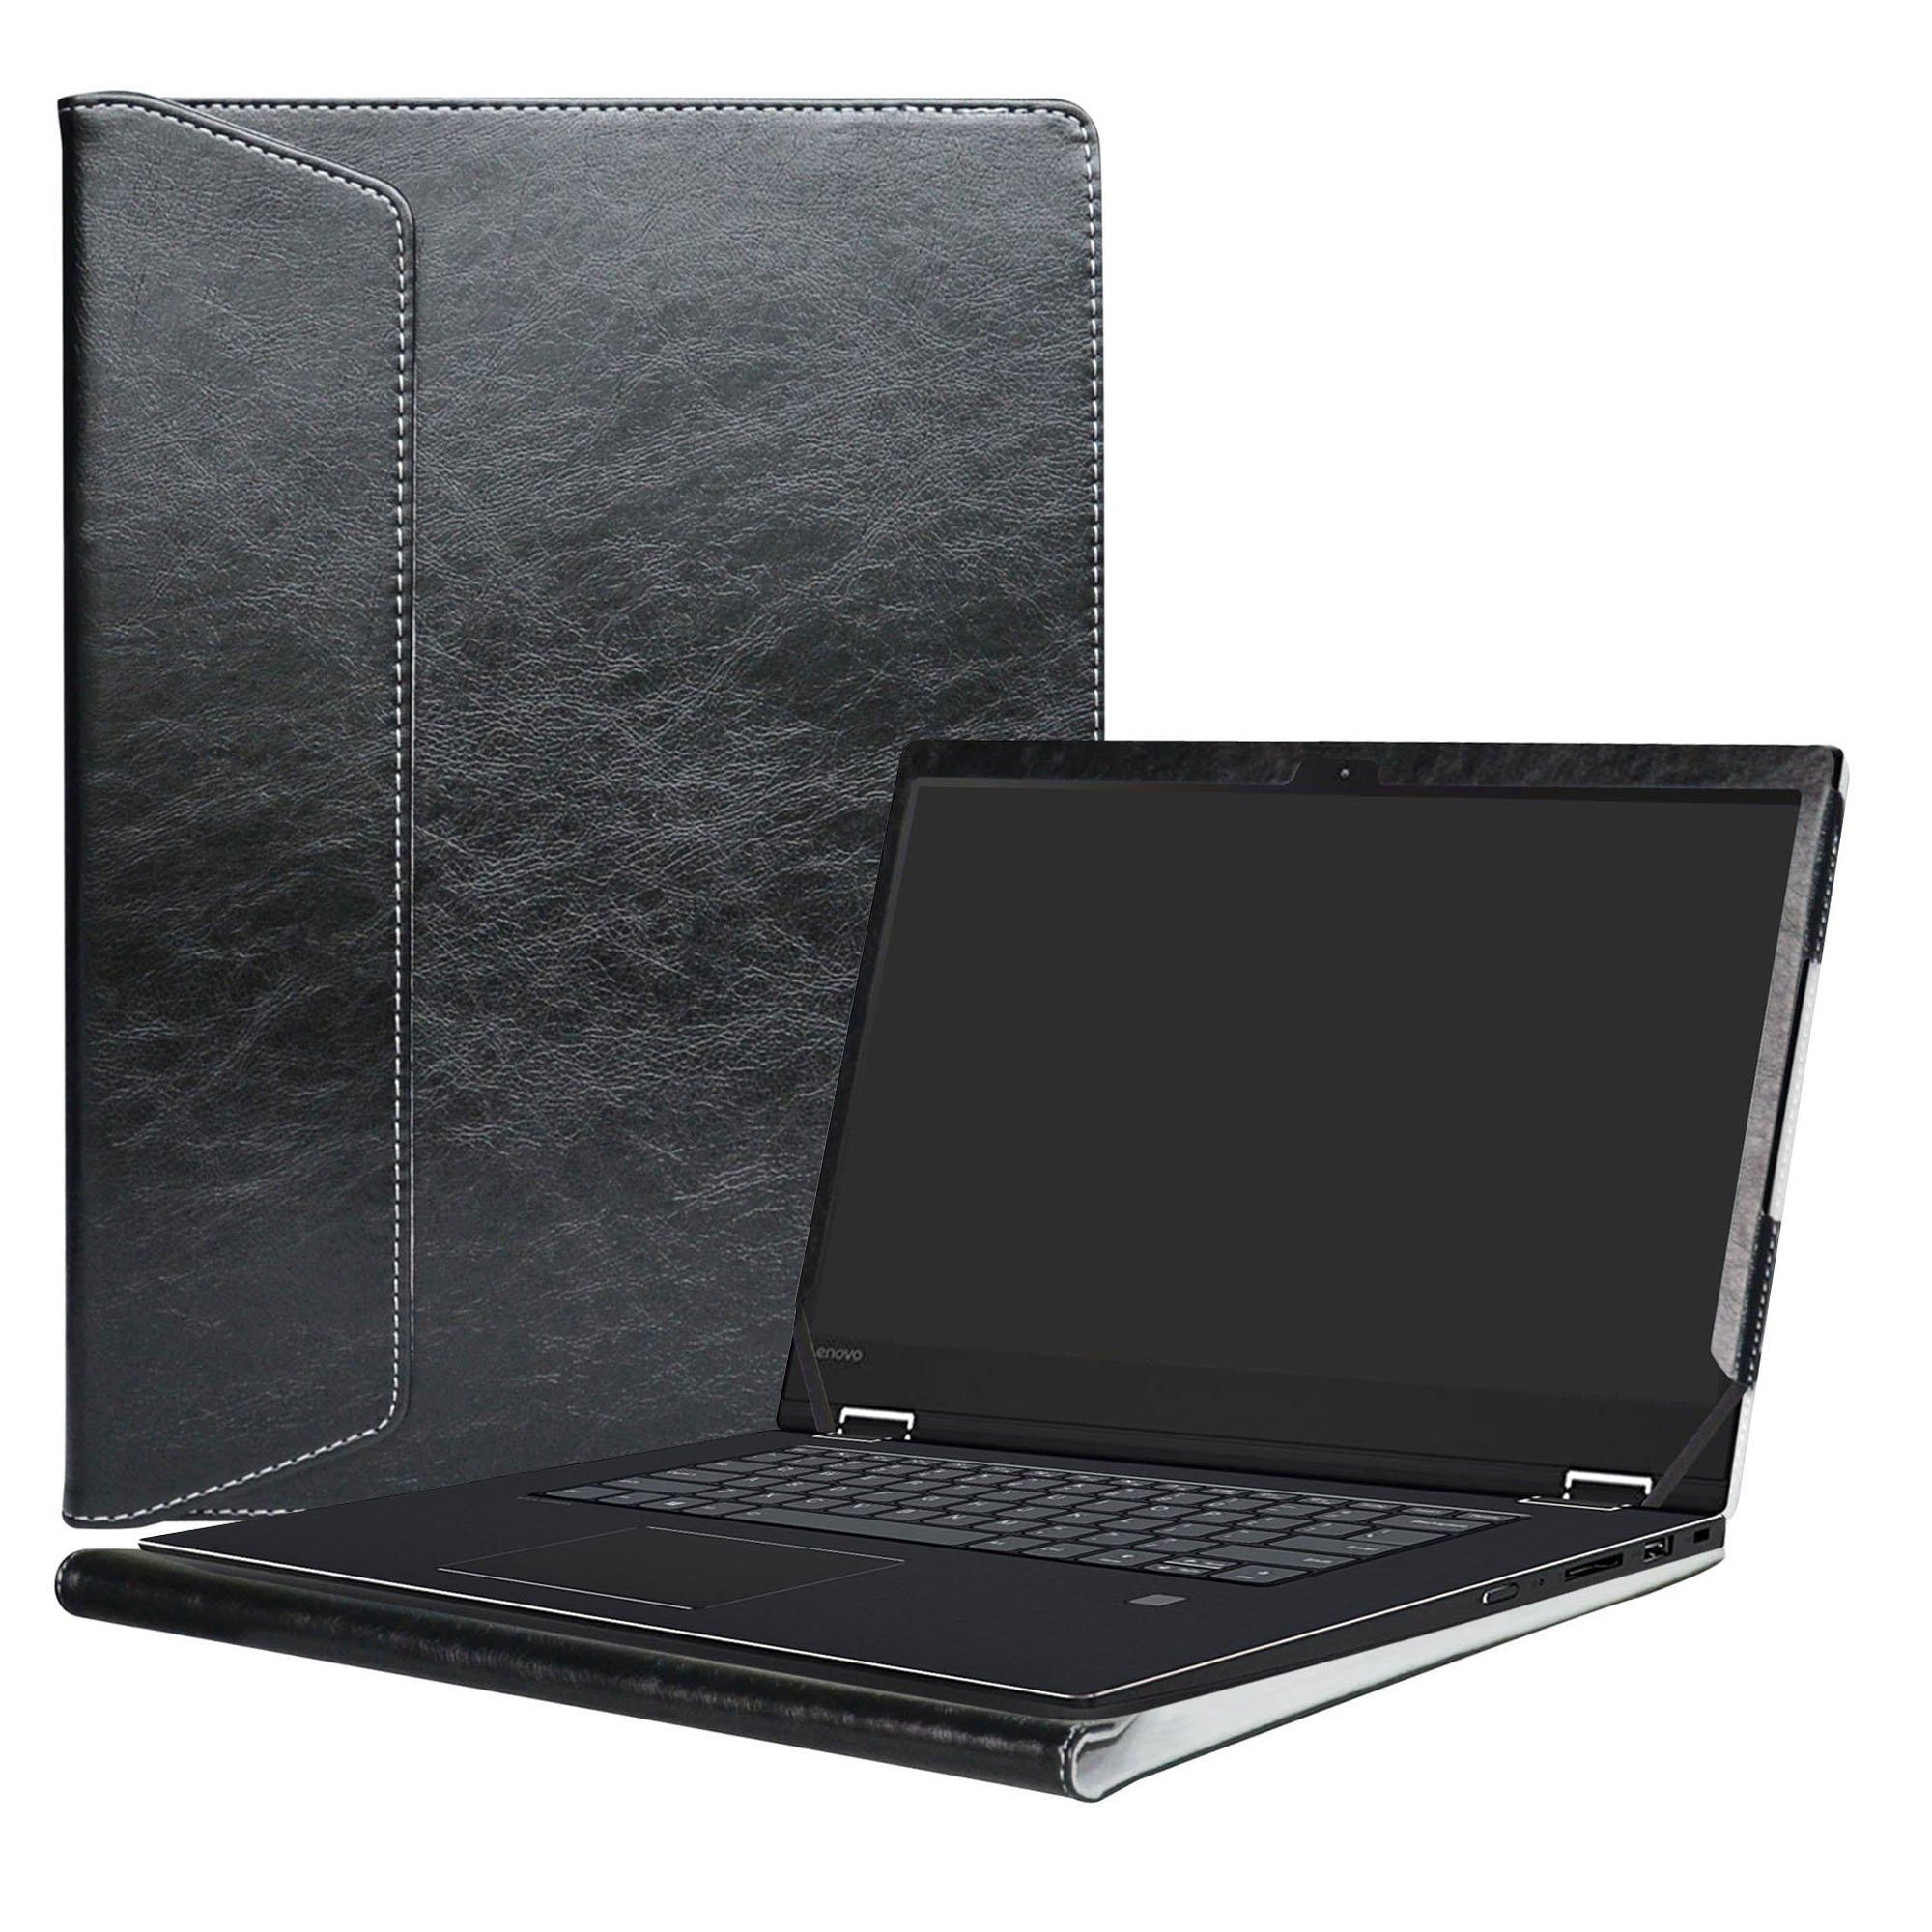 "Alapmk Protective Case Cover For 15.6"" Lenovo Flex"